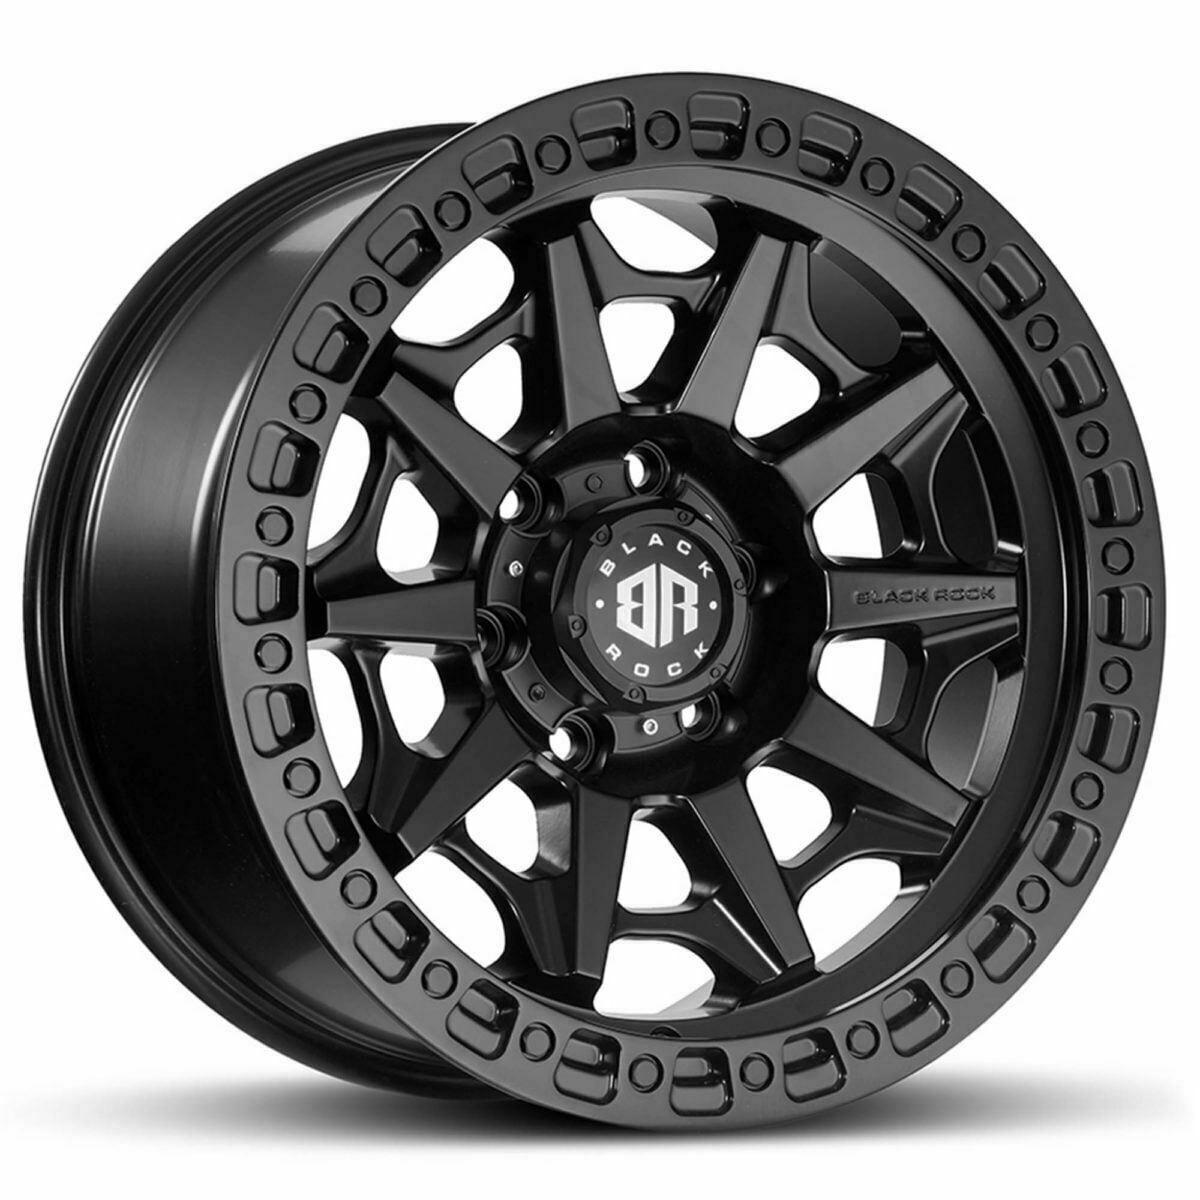 Black Rock Cage Satin Black Wheels Off-Road Rims